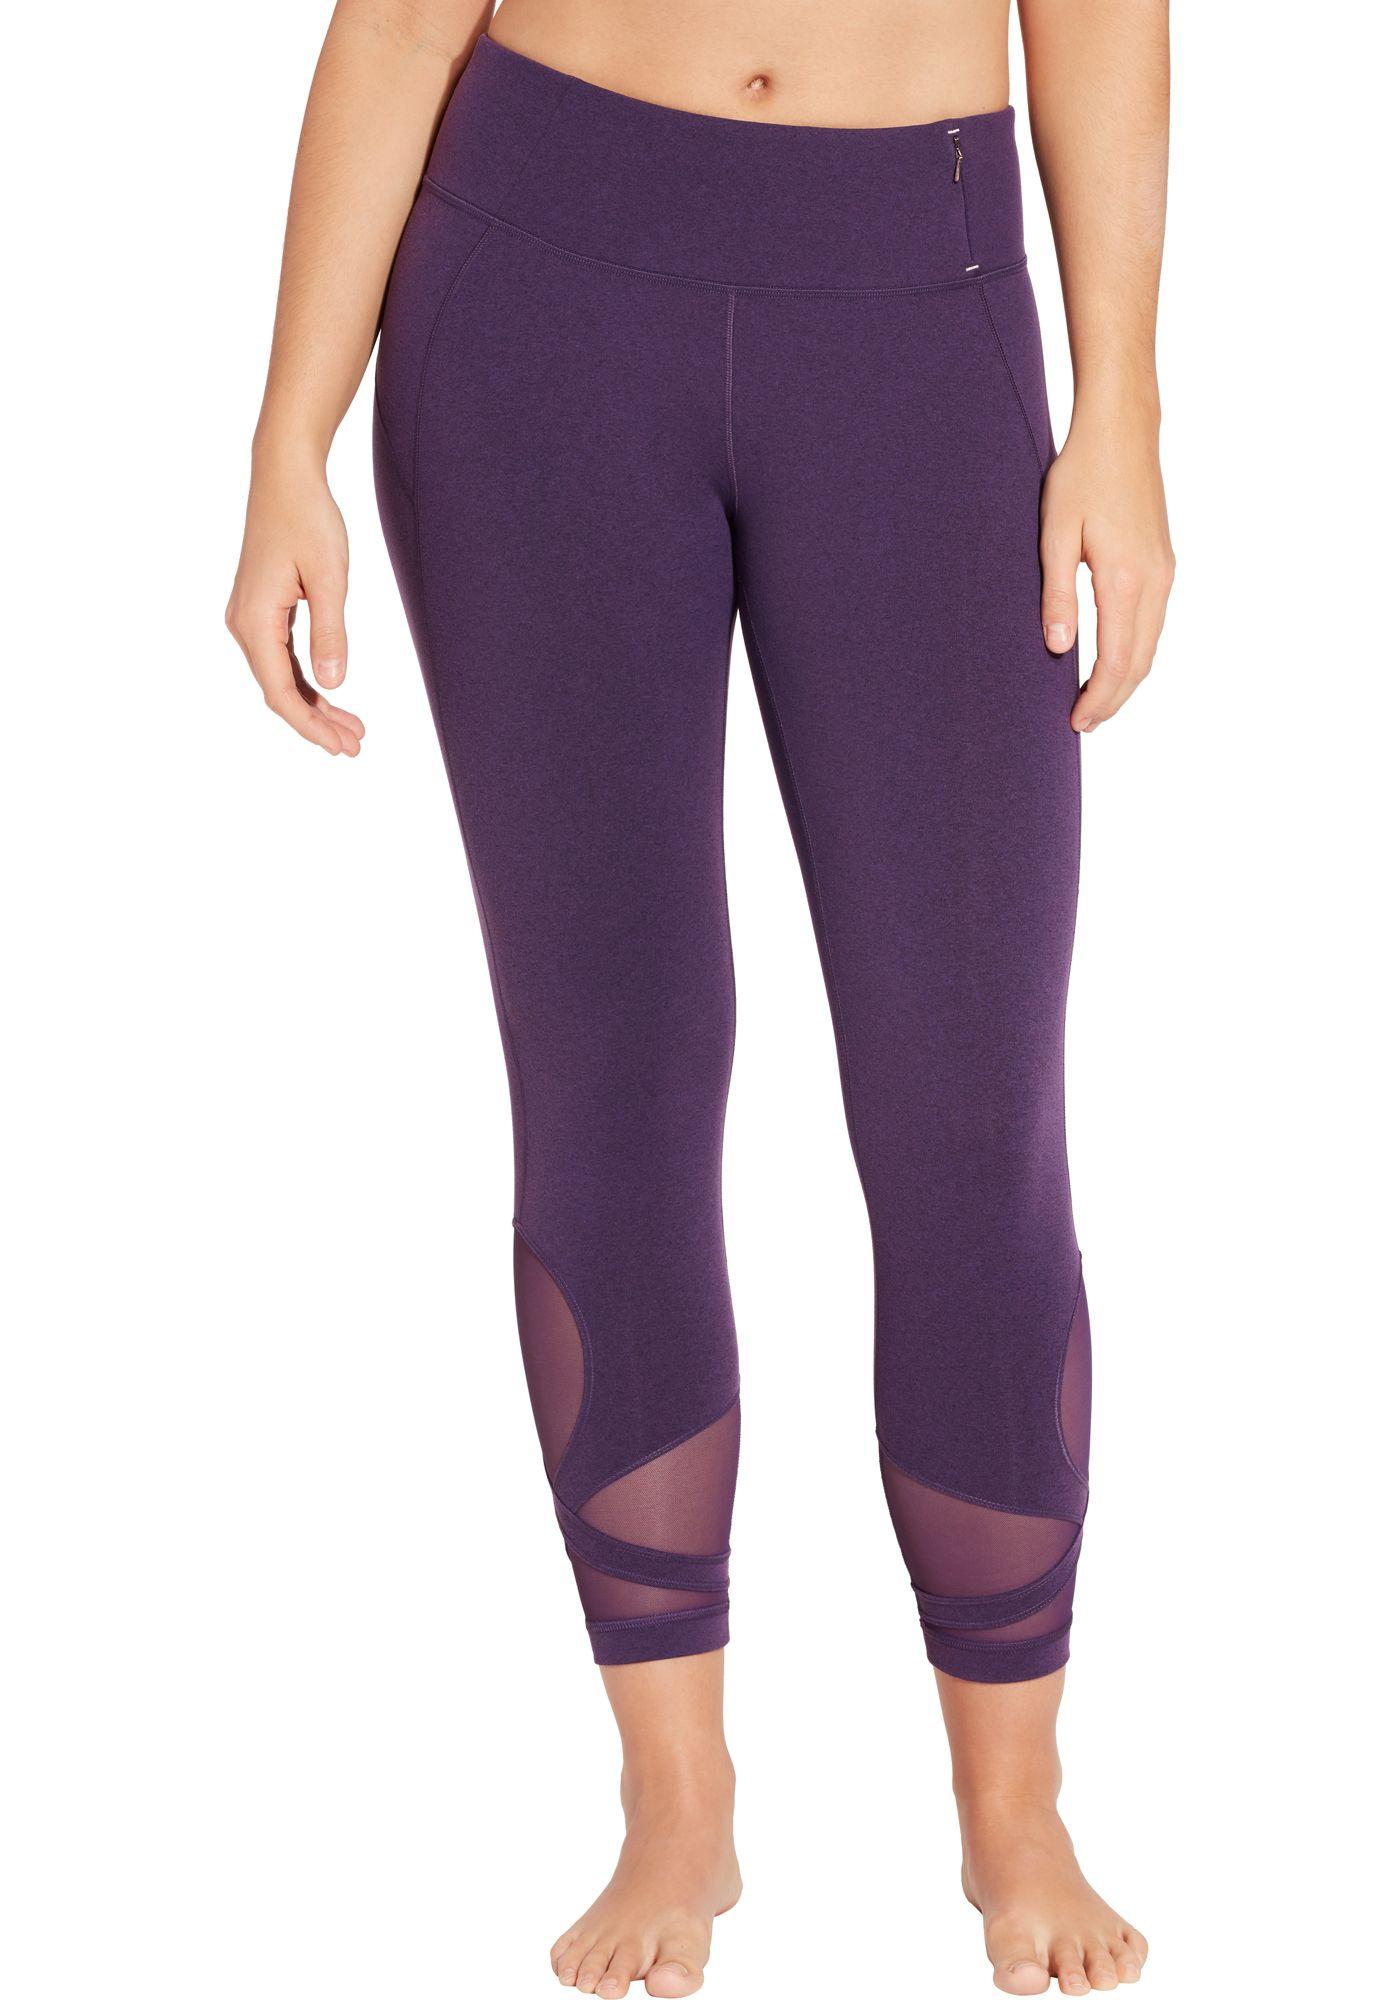 CALIA by Carrie Underwood Women's Essential 7/8 Wrap Leggings